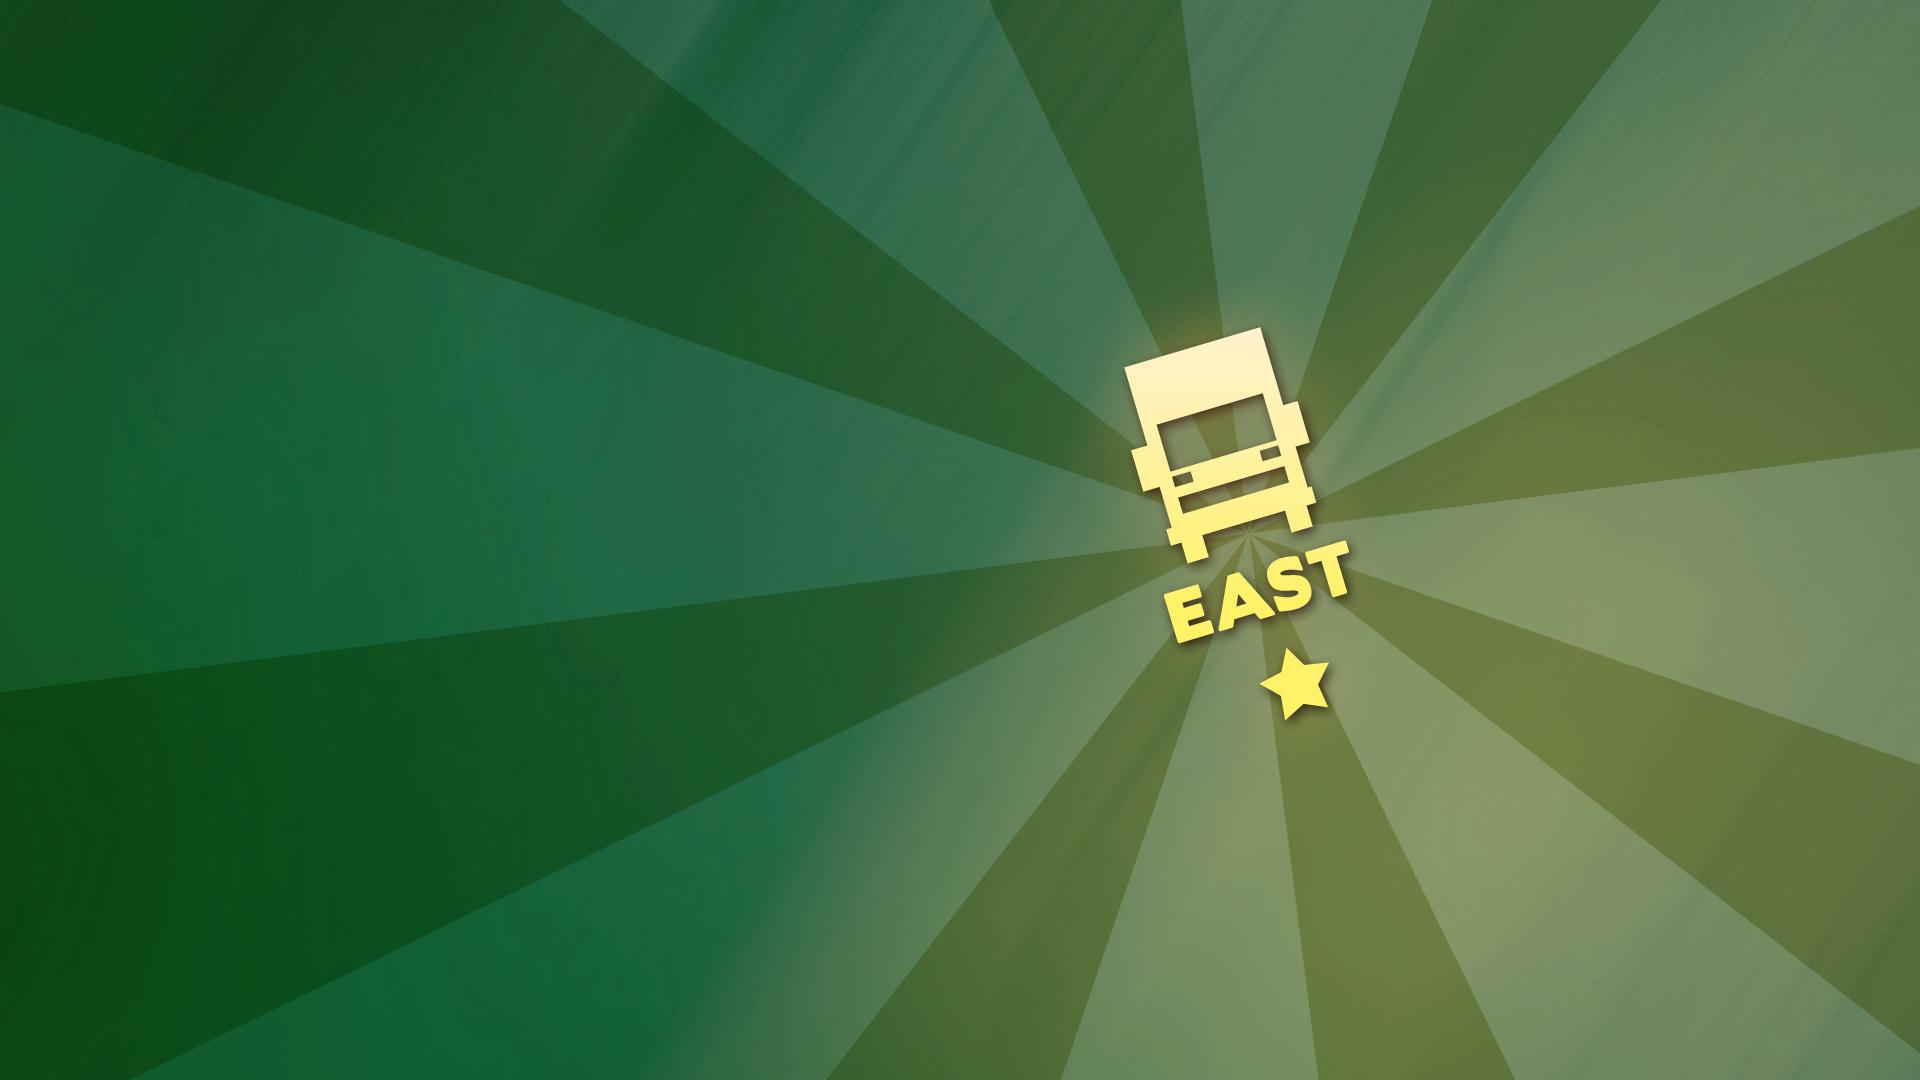 Truck insignia 'East'